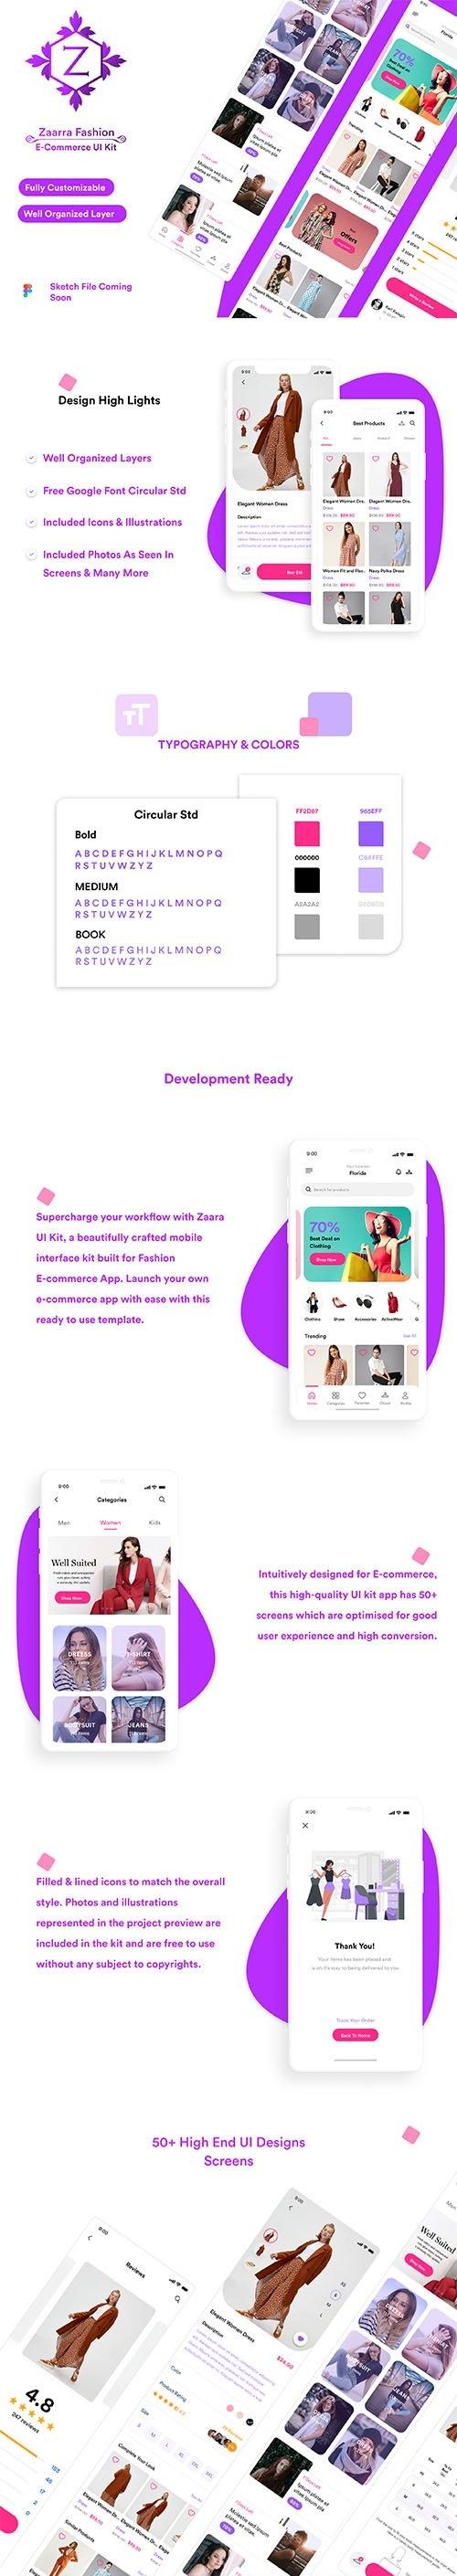 Zaara Fashion ecommerce UI Kit